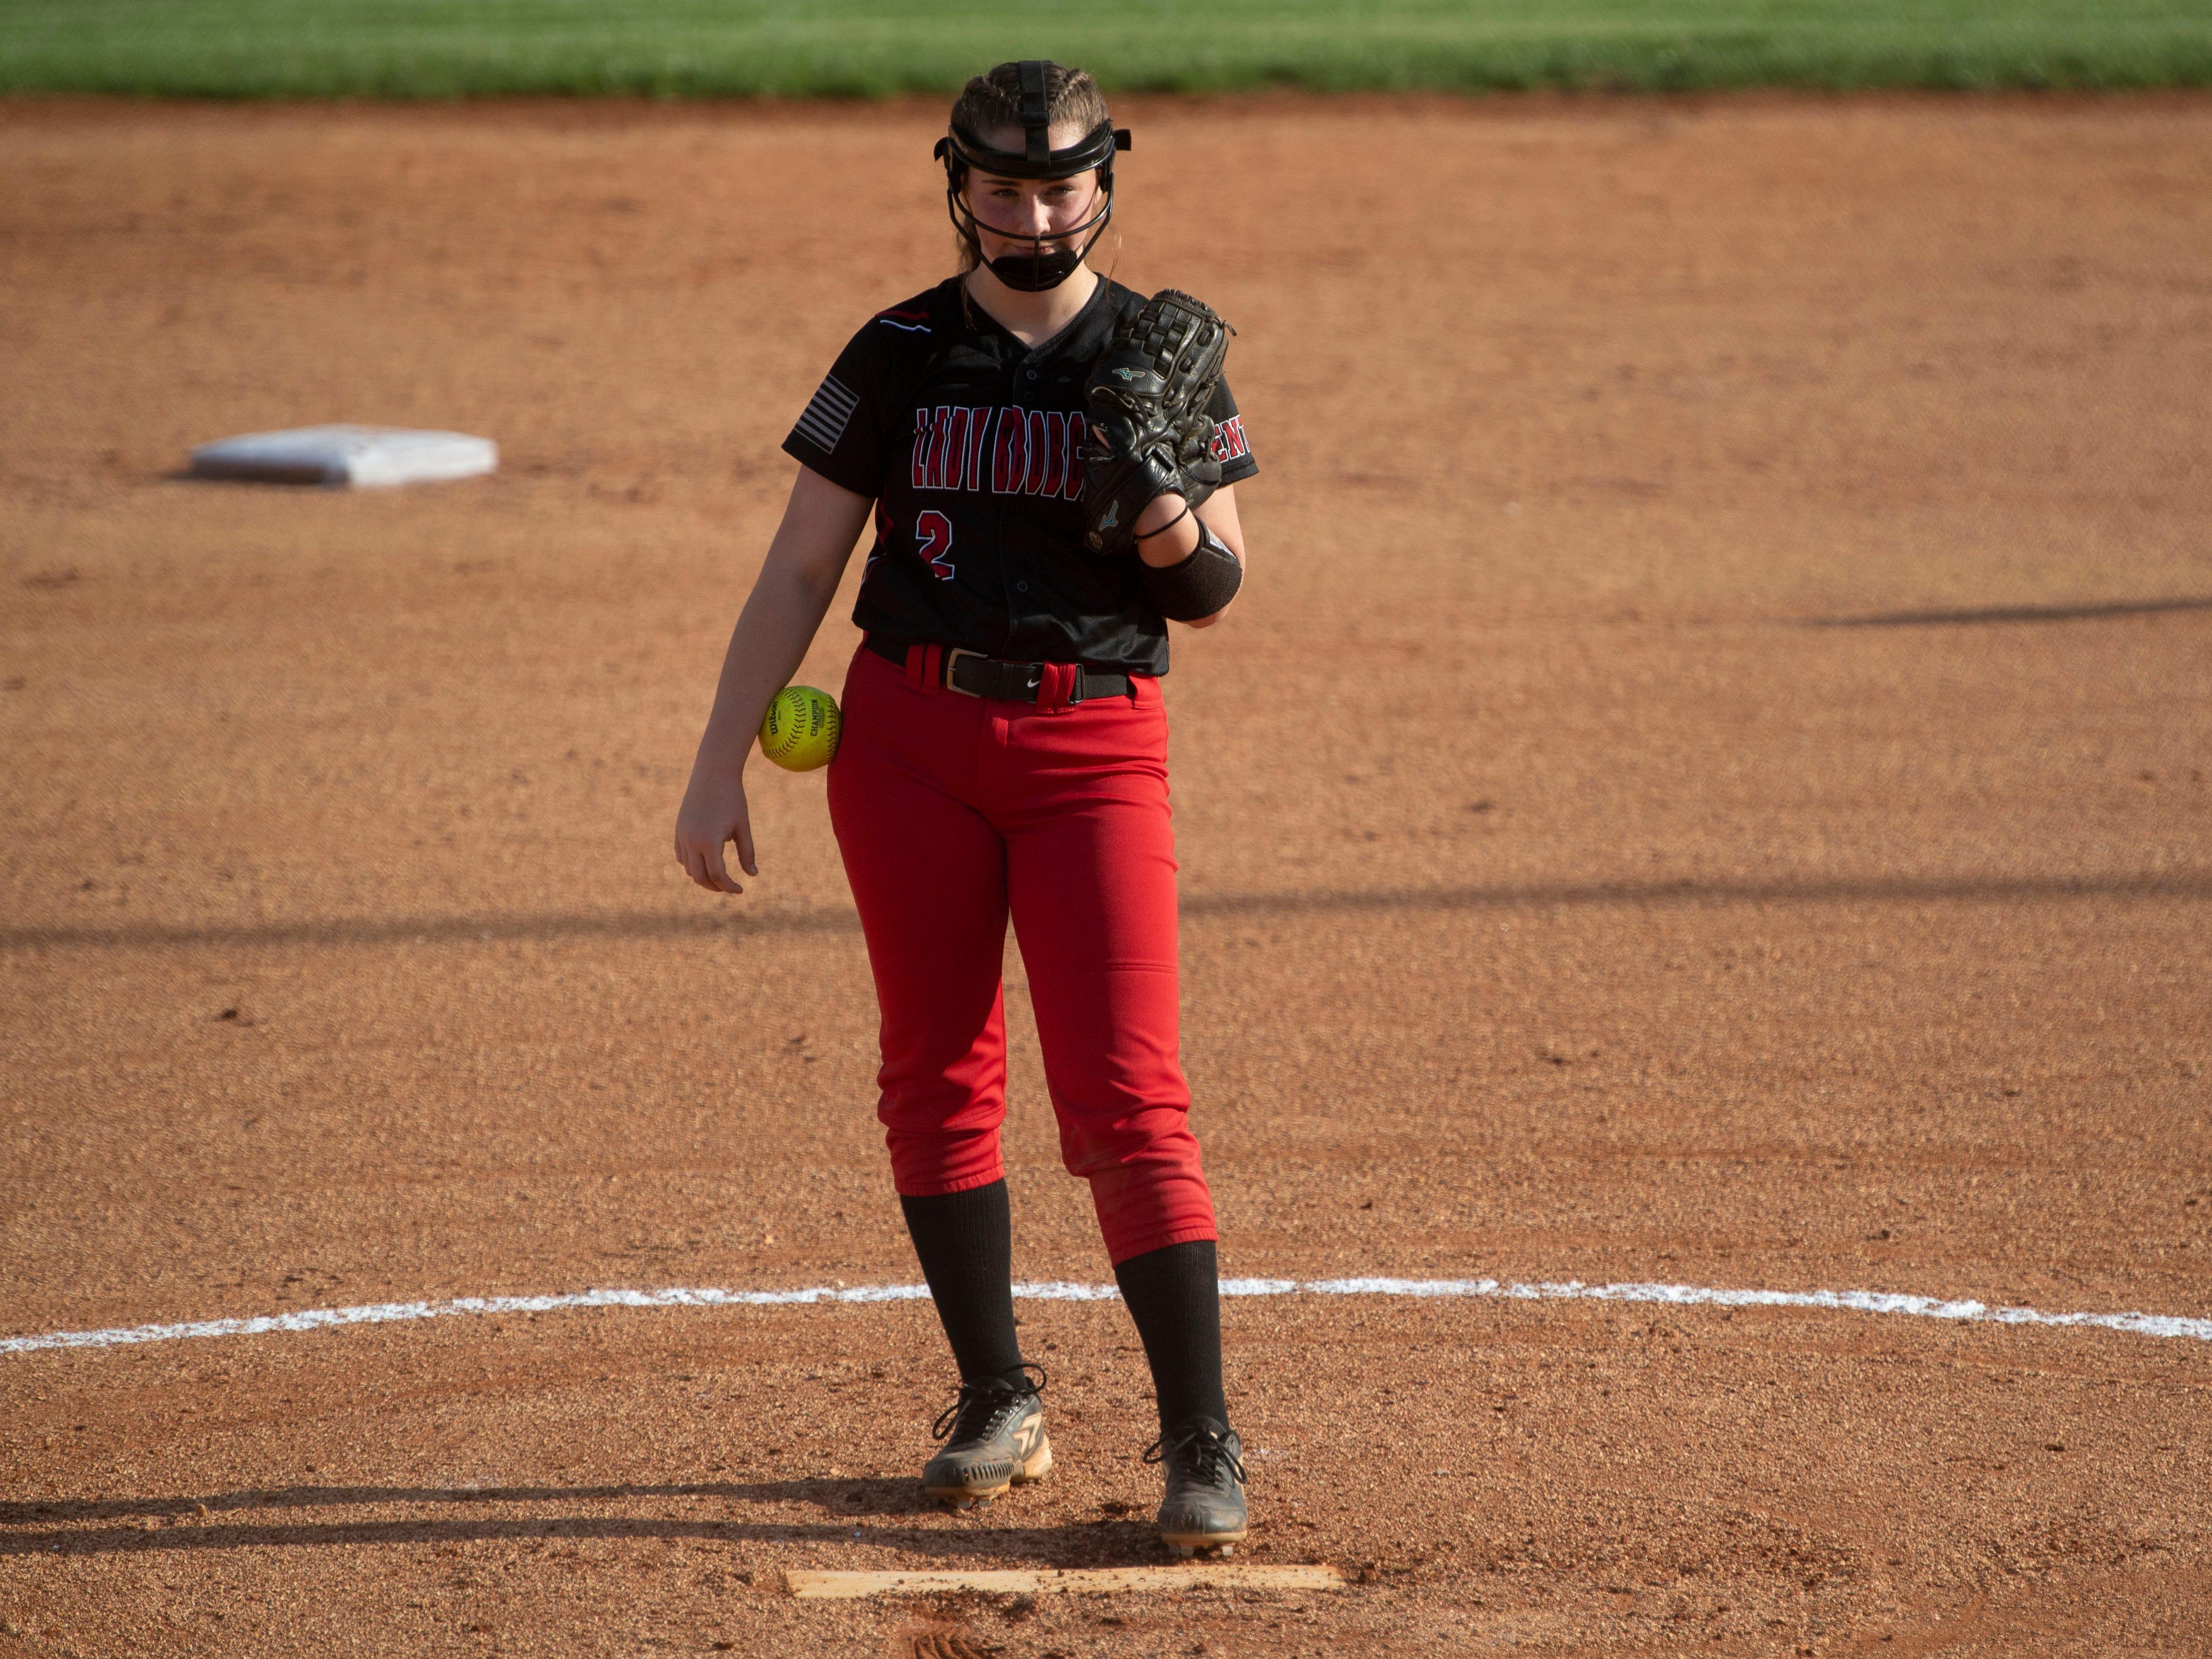 Central's Megan Merritt (2) pitching against Powell on Thursday, April 11, 2019.